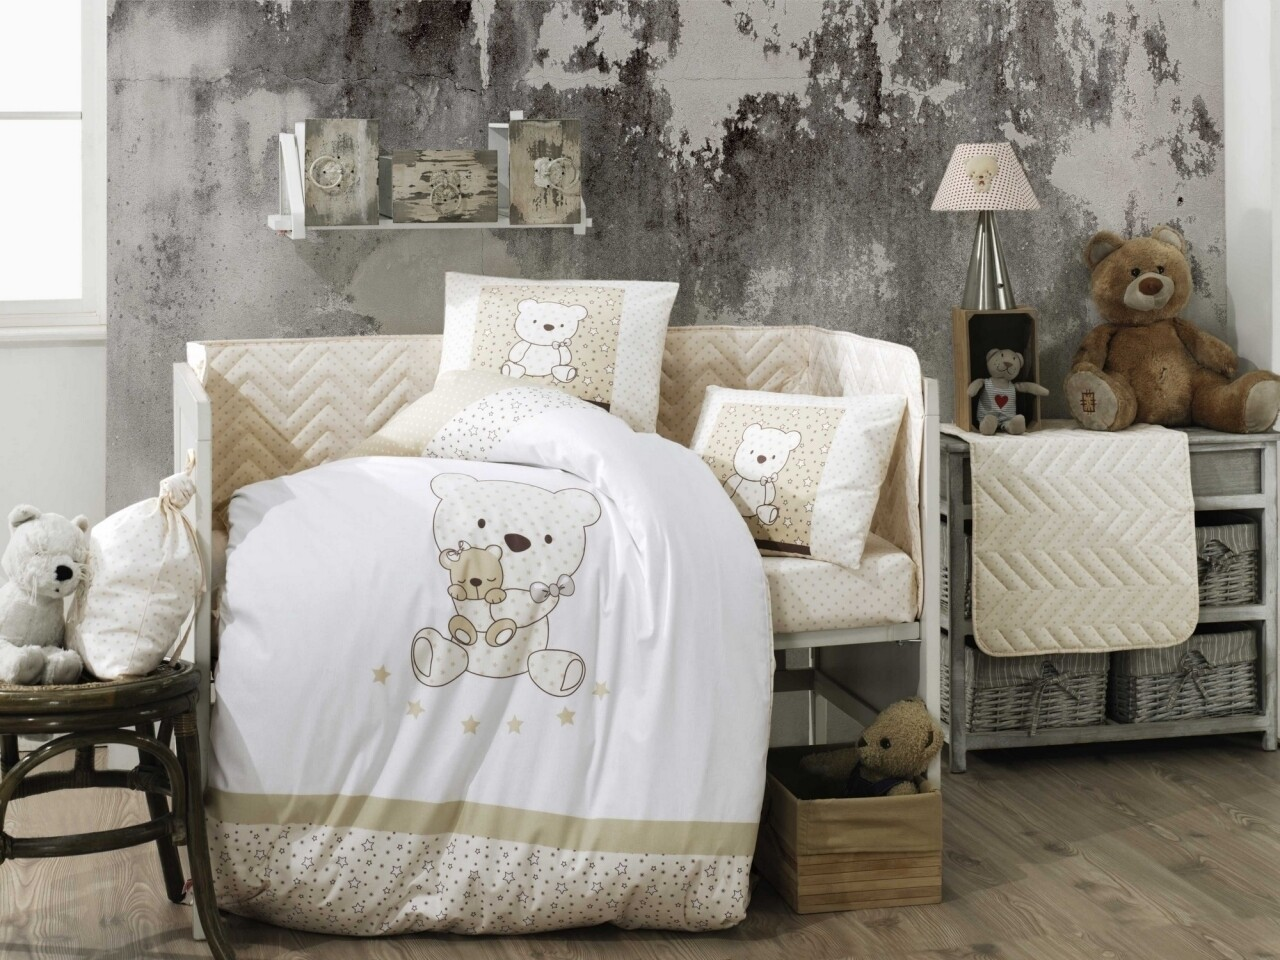 Lenjerie de pat pentru copii, 4 piese, 100% bumbac poplin, Hobby, Bonita Gold